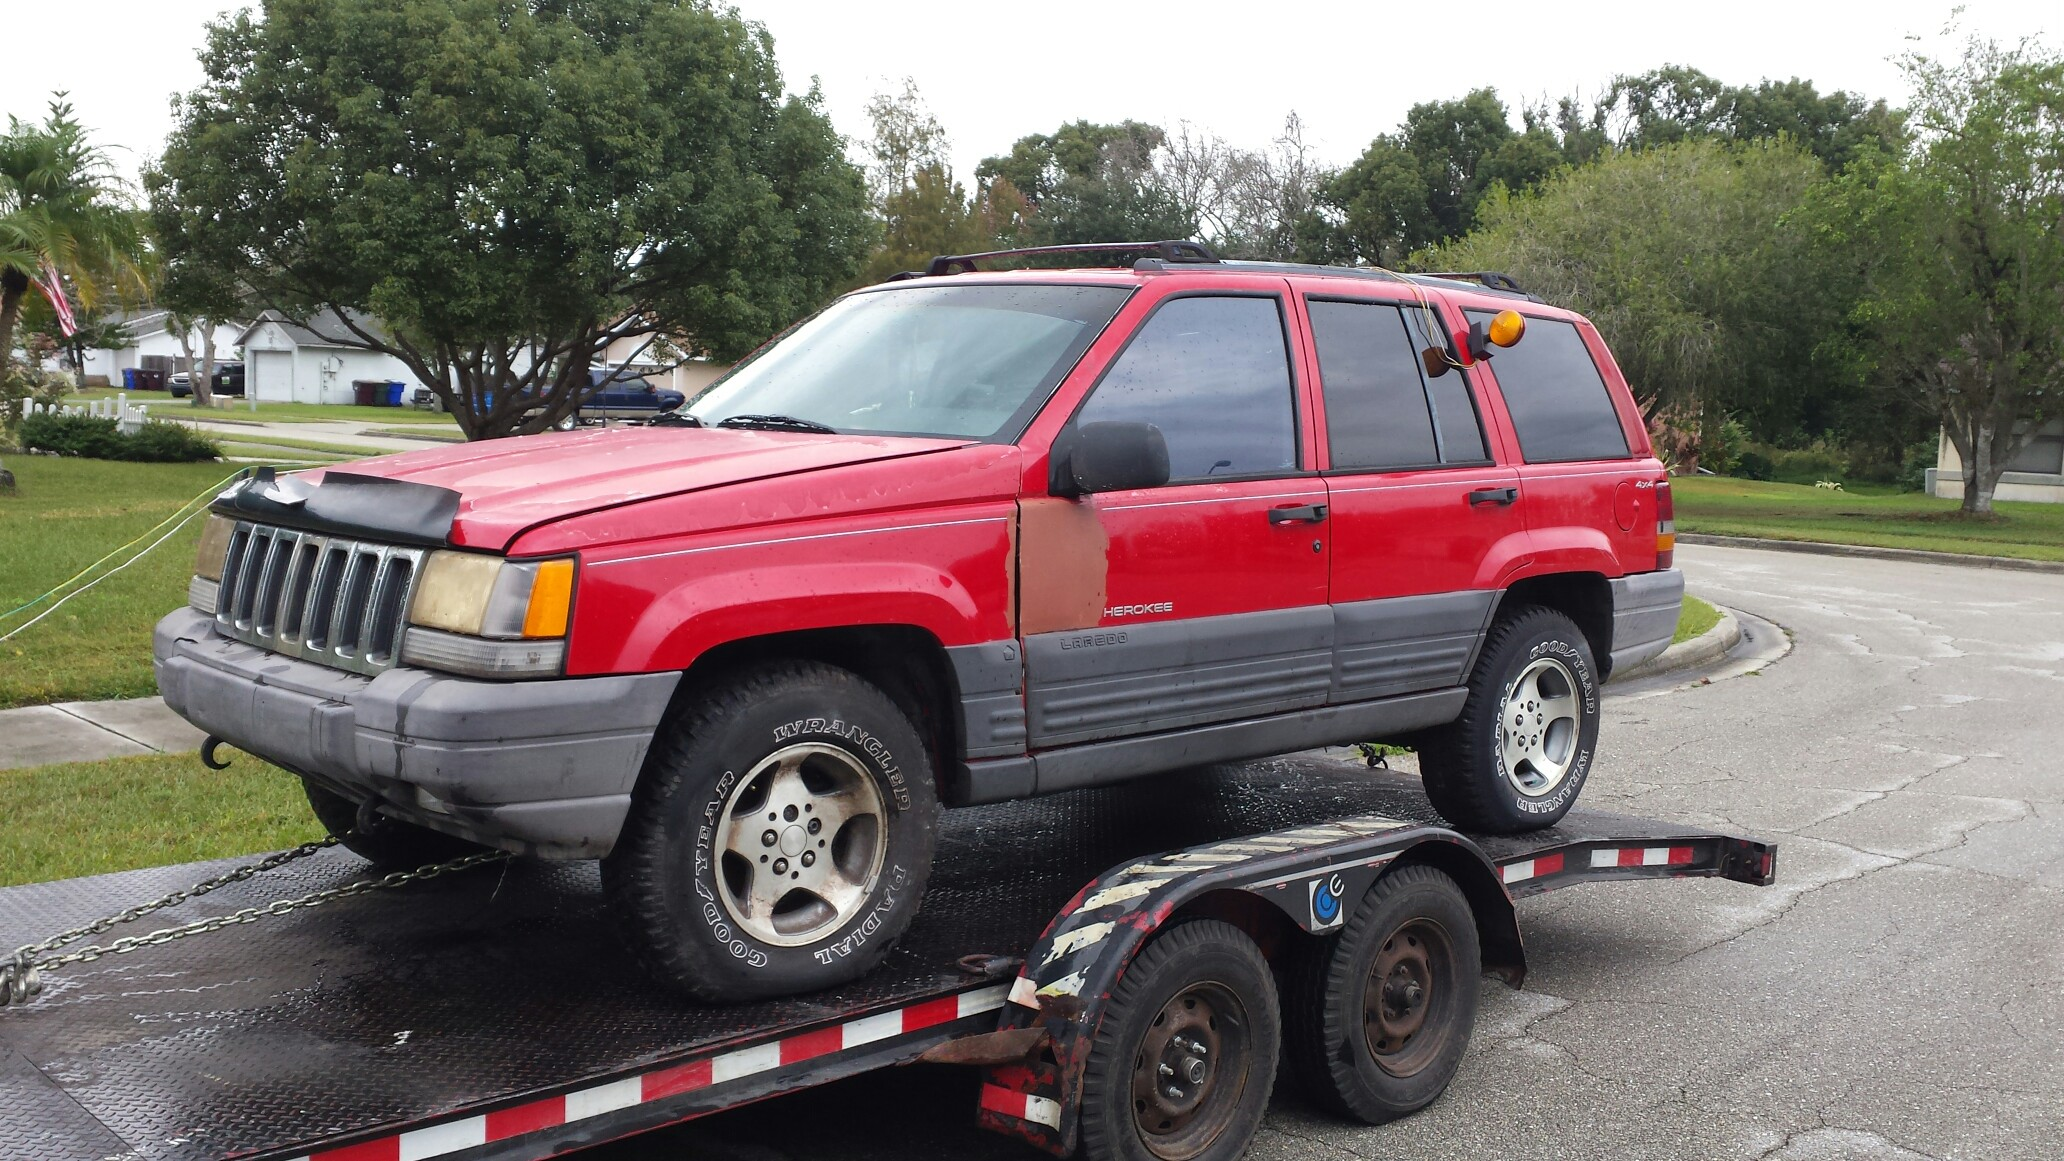 Junk Jeep Cherokee - Purchased in Orlando, FL